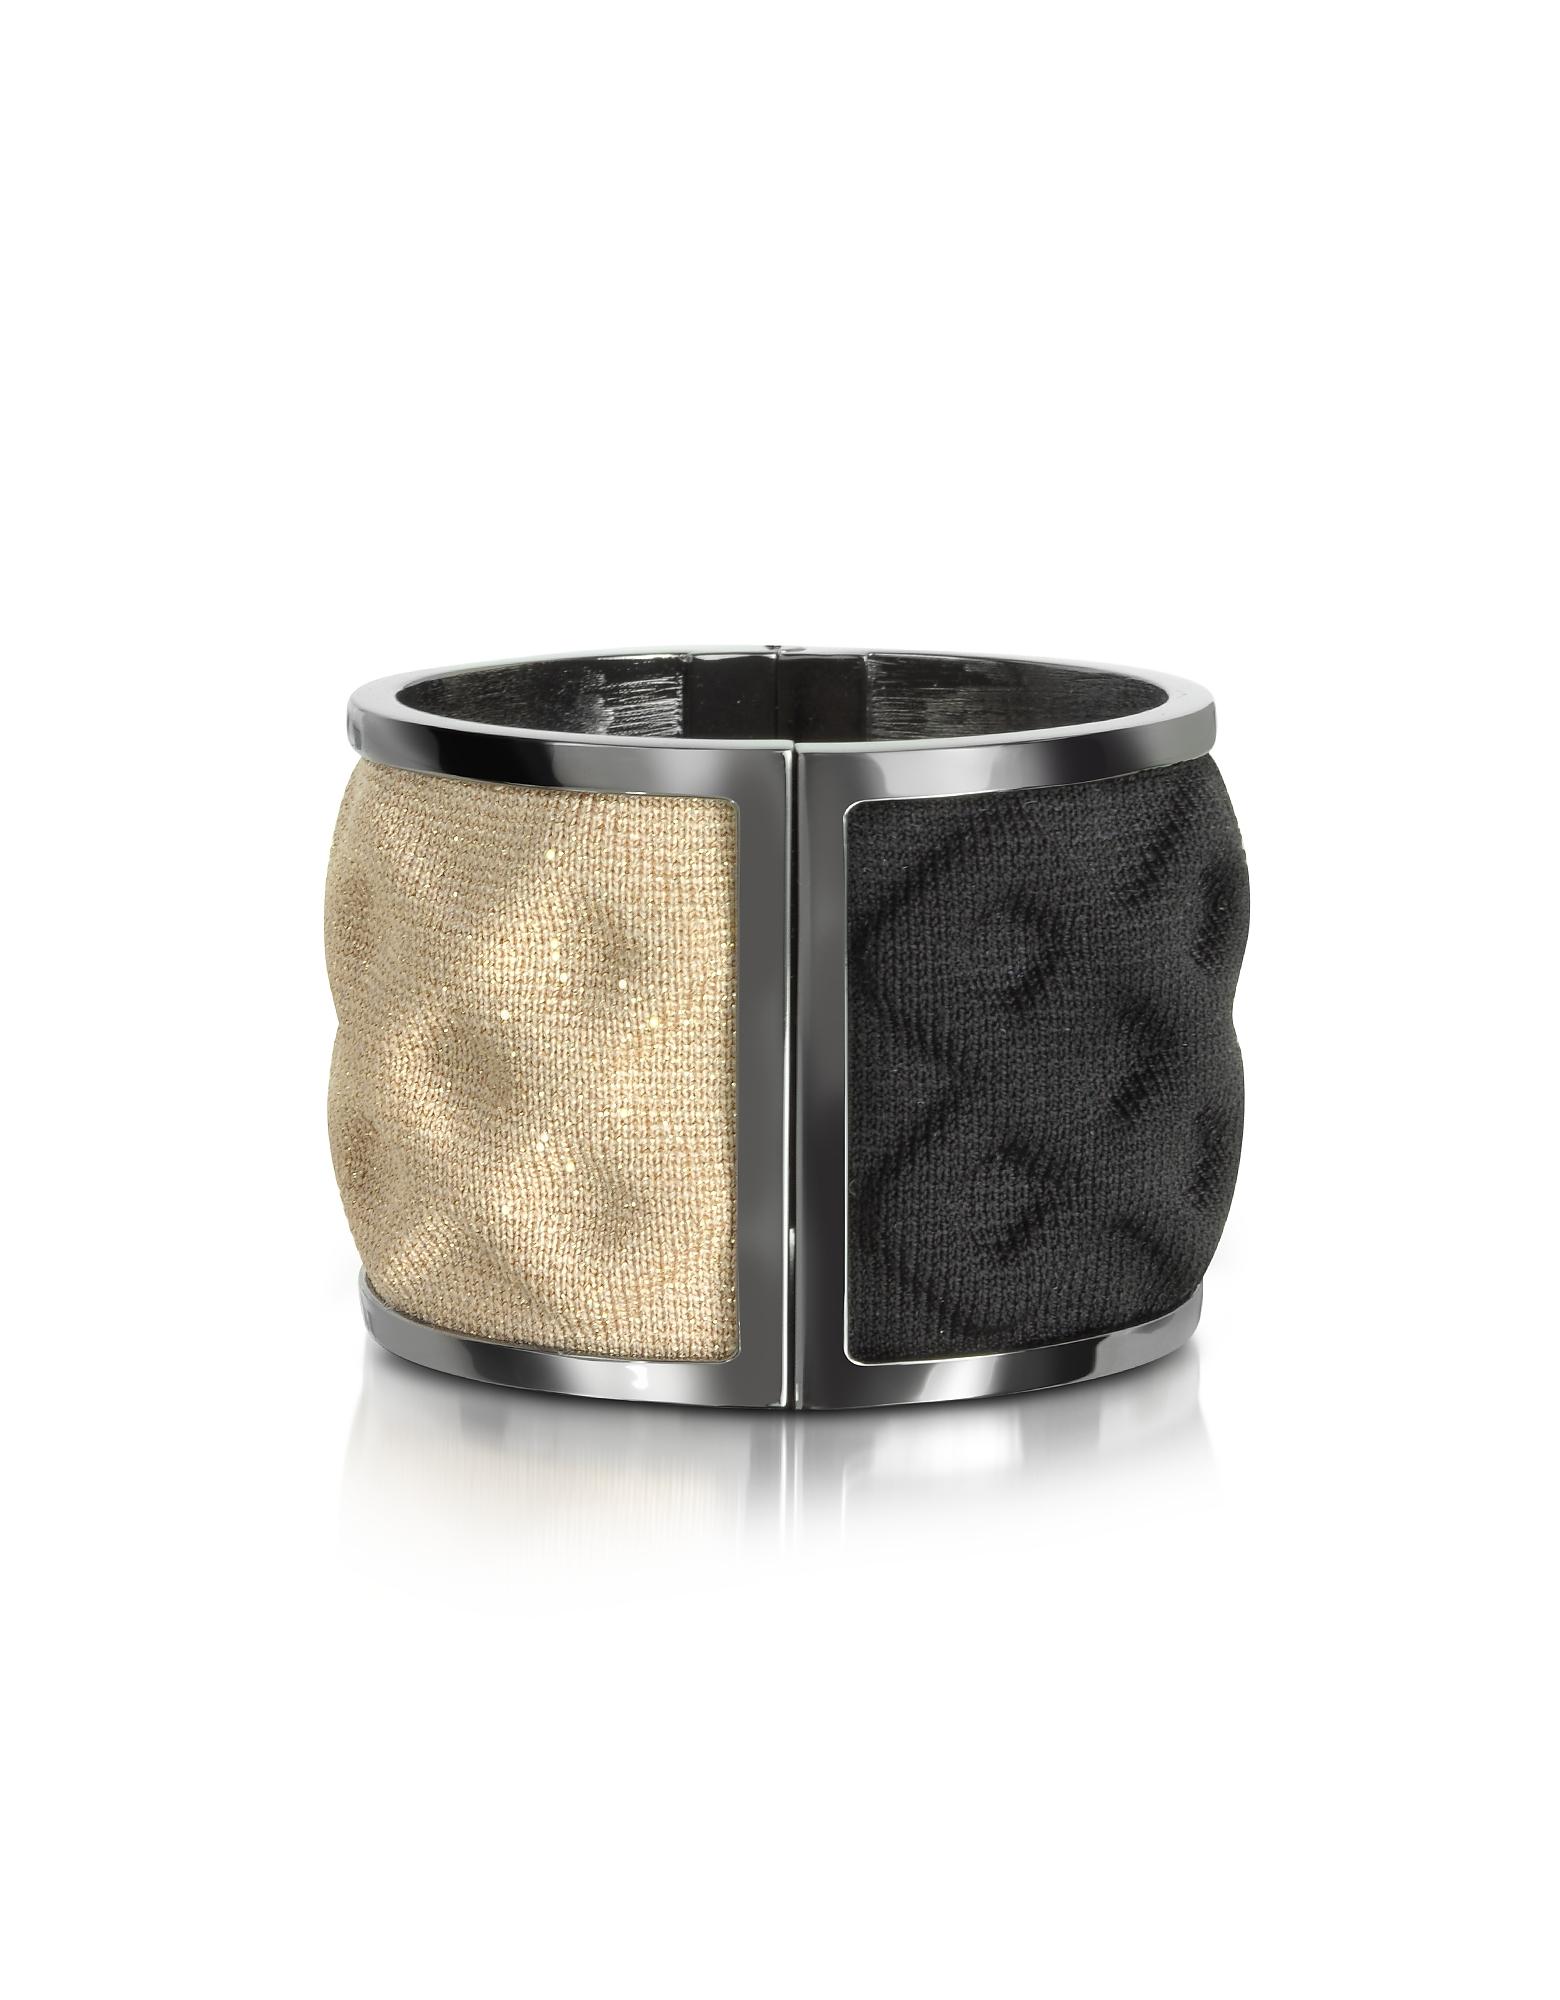 Avril 8790 Bracelets, Double Ruthenium Plated Brass and Black/Gold Viscose Bangle